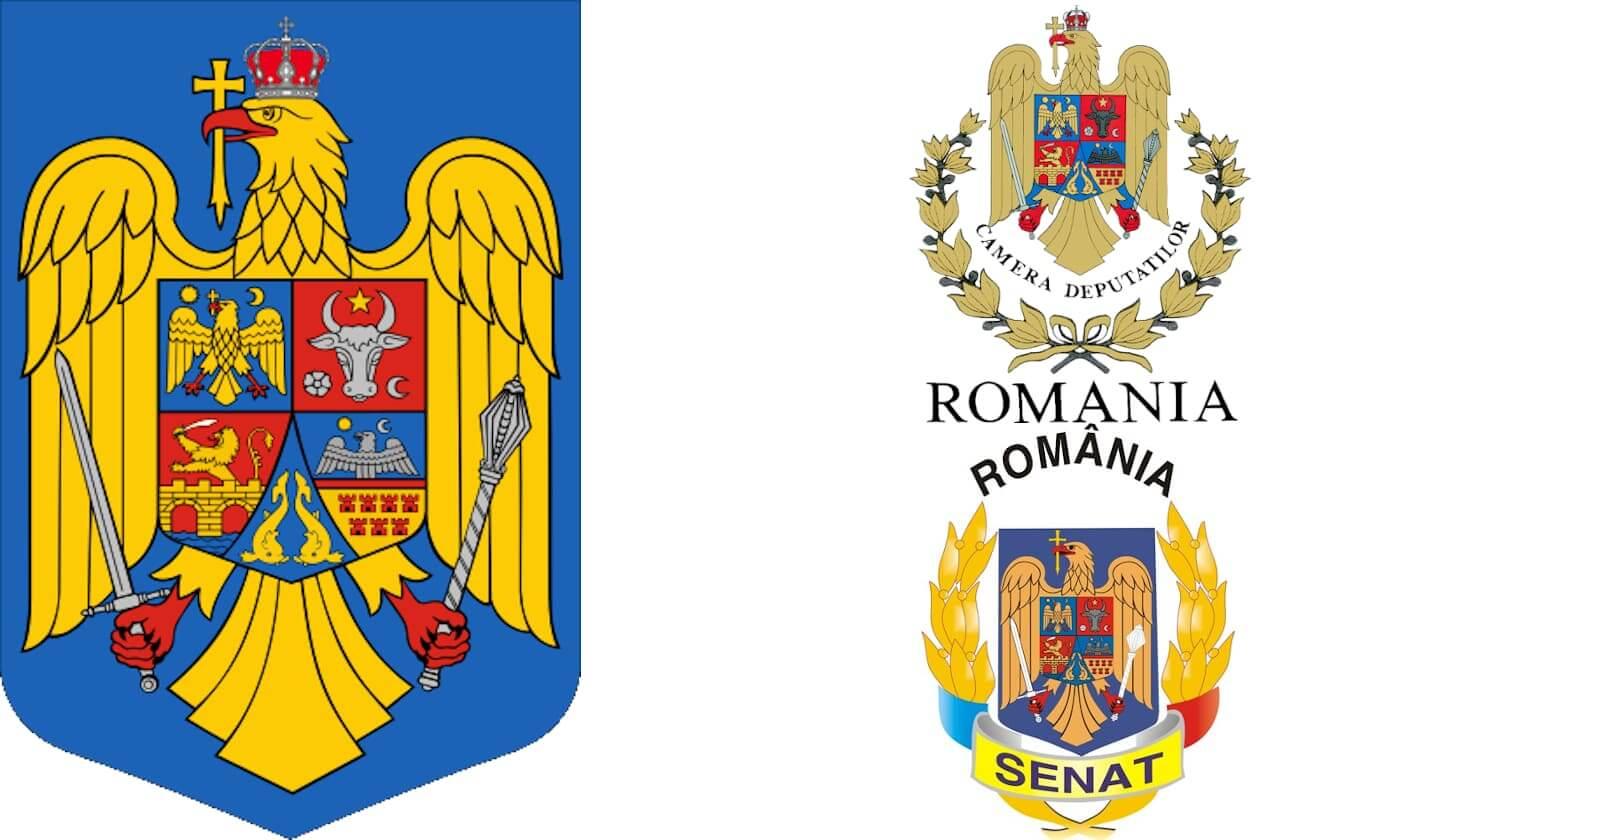 https://ziarul.romania-rationala.ro/control/articole/articole/parlamentul-romaniei-banner_3.jpg